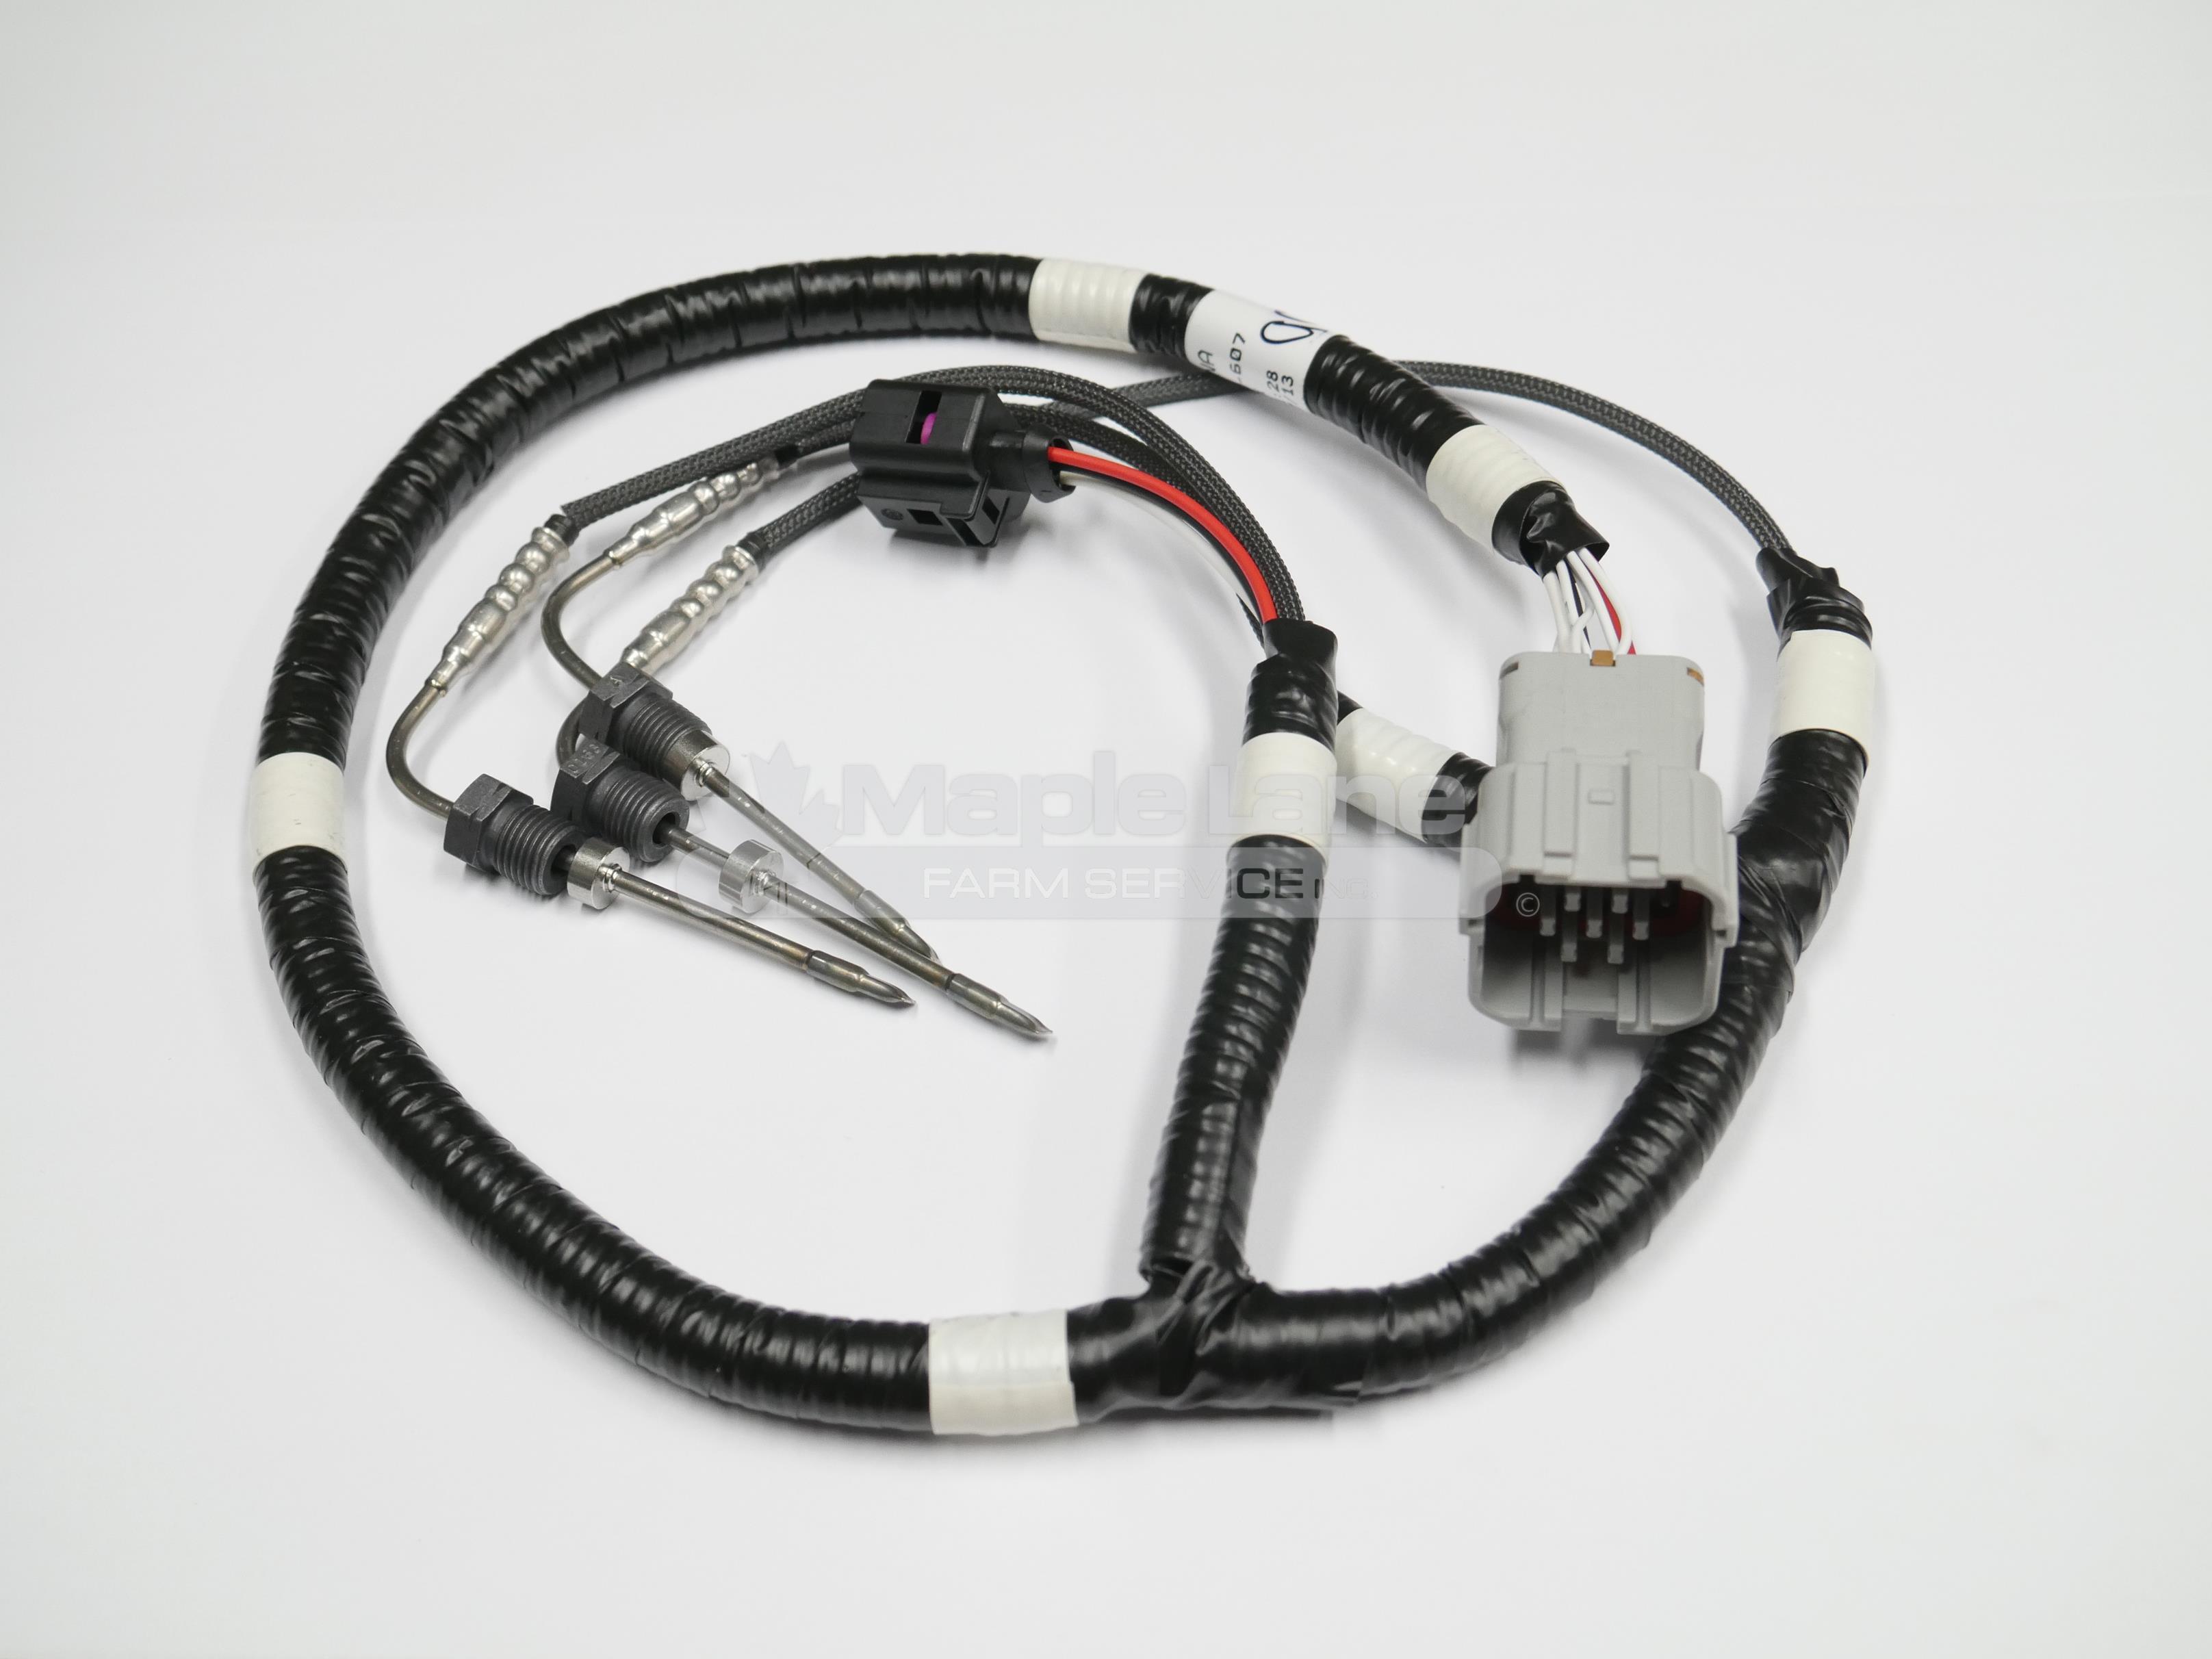 7102085M1 Harness and Sensor